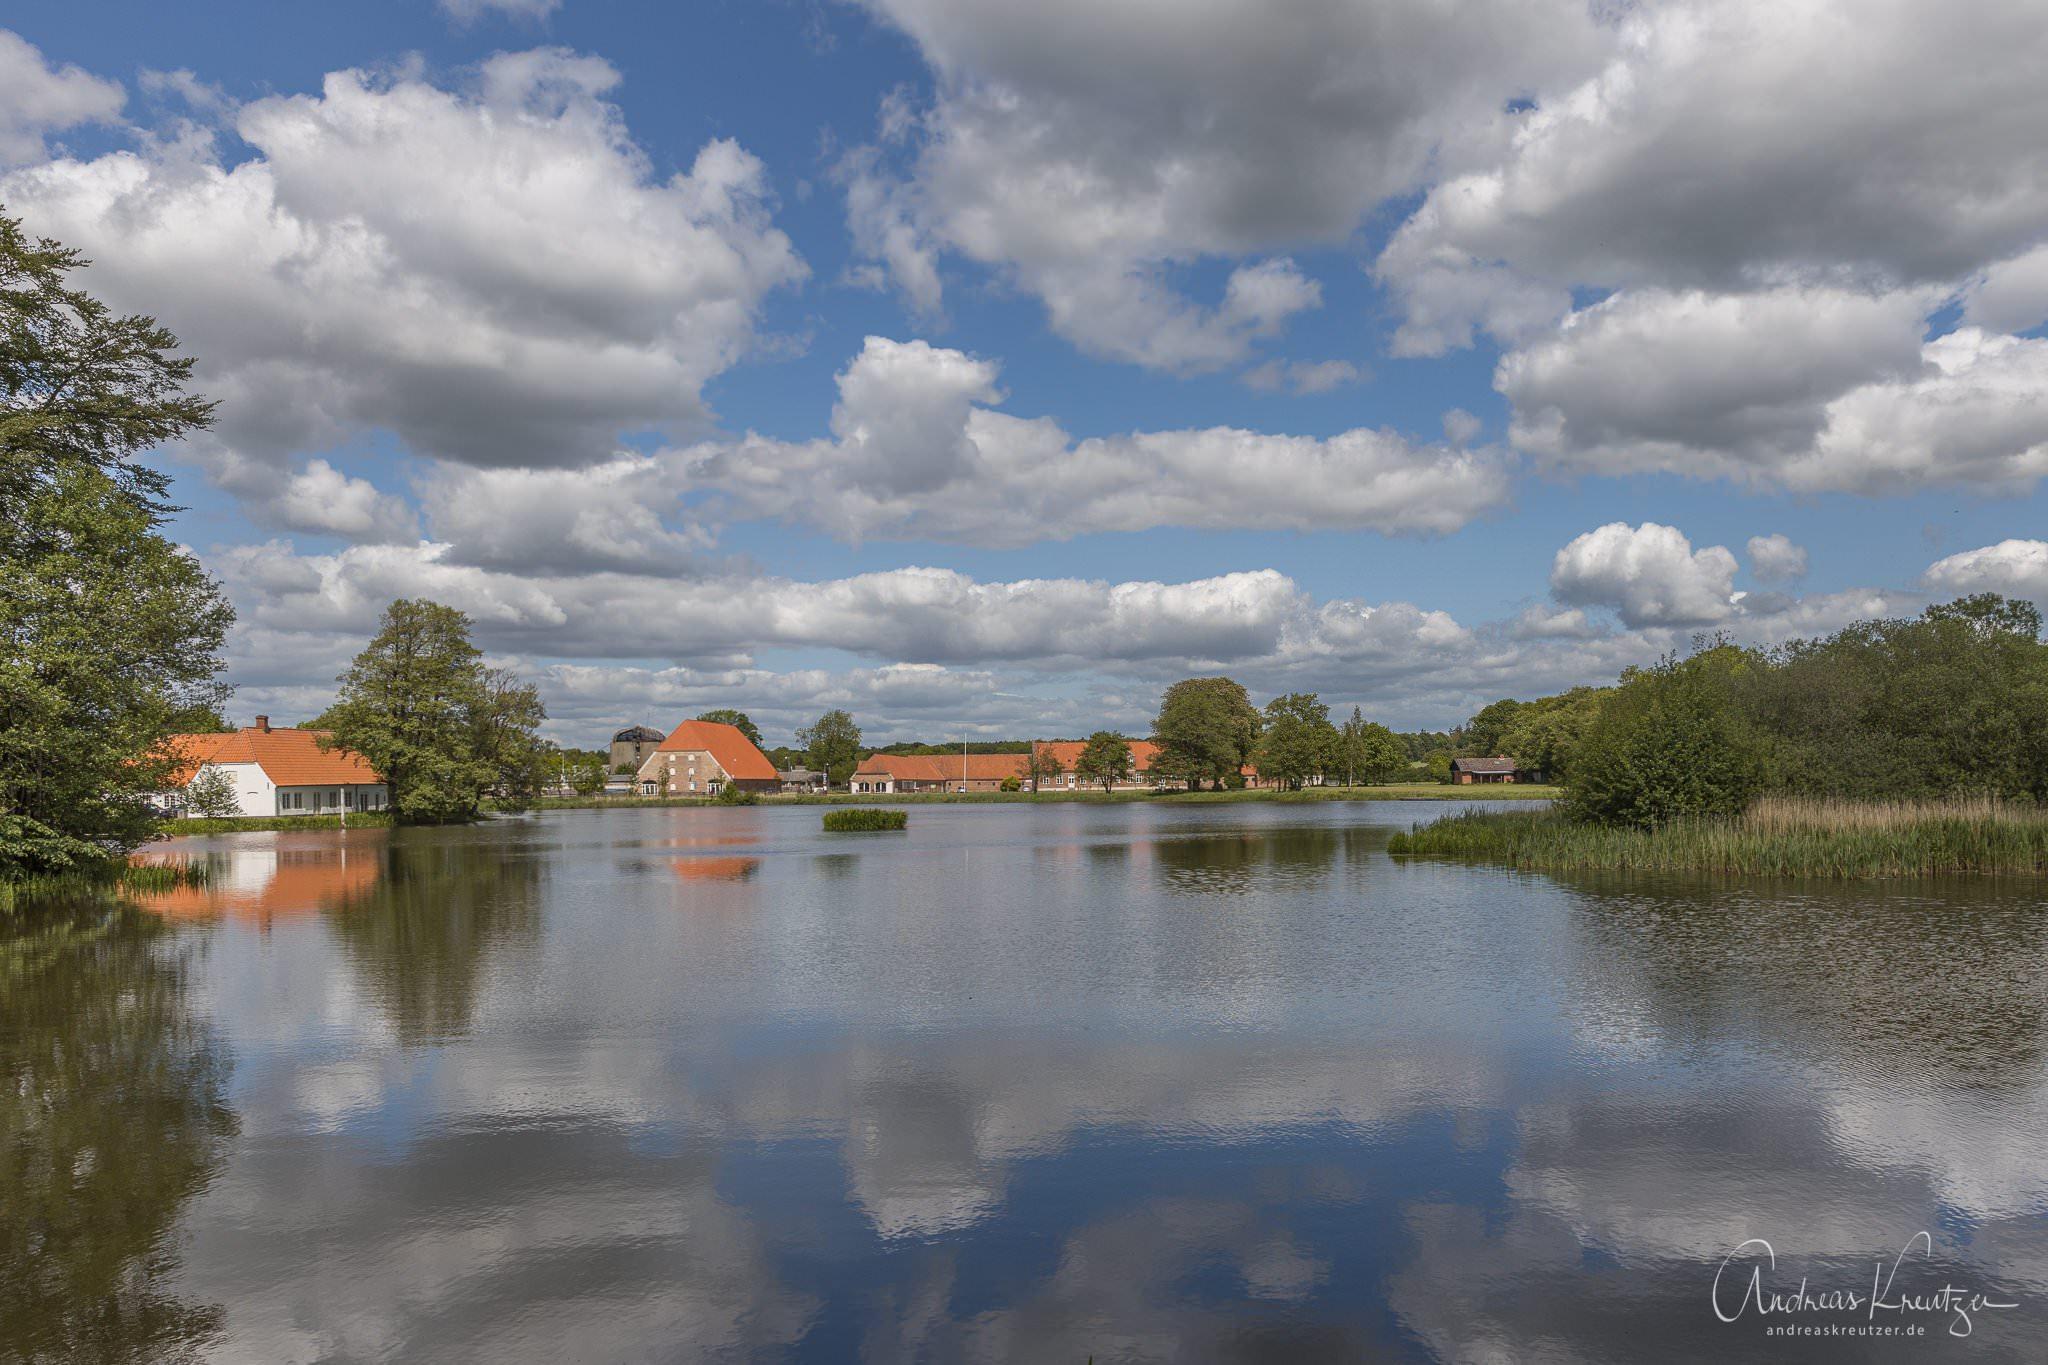 Gram Schlosssee